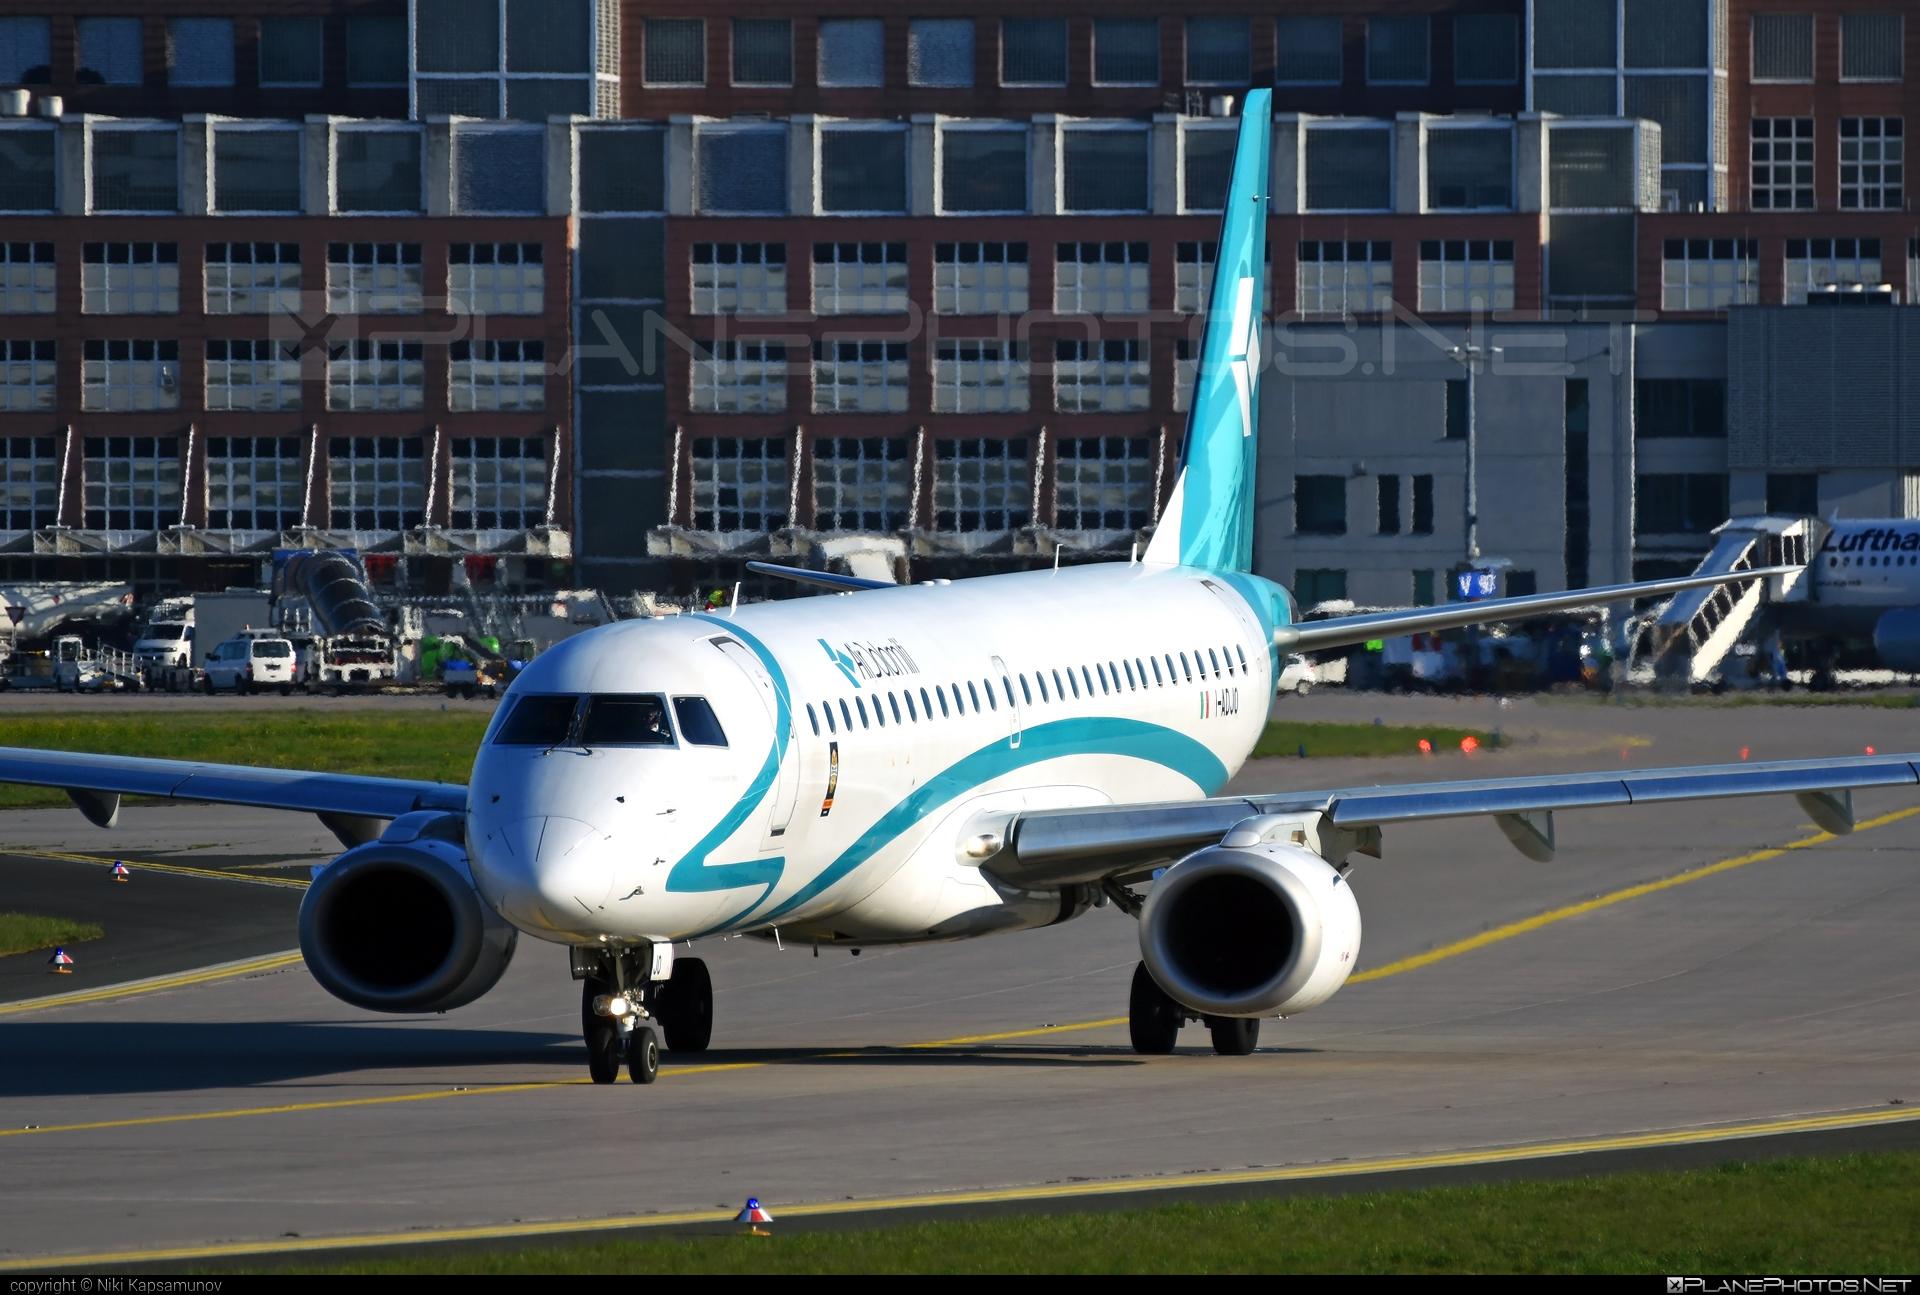 Embraer 190-200LR - I-ADJO operated by Air Dolomiti #airdolomiti #e195 #embraer #embraer195 #embraer195lr